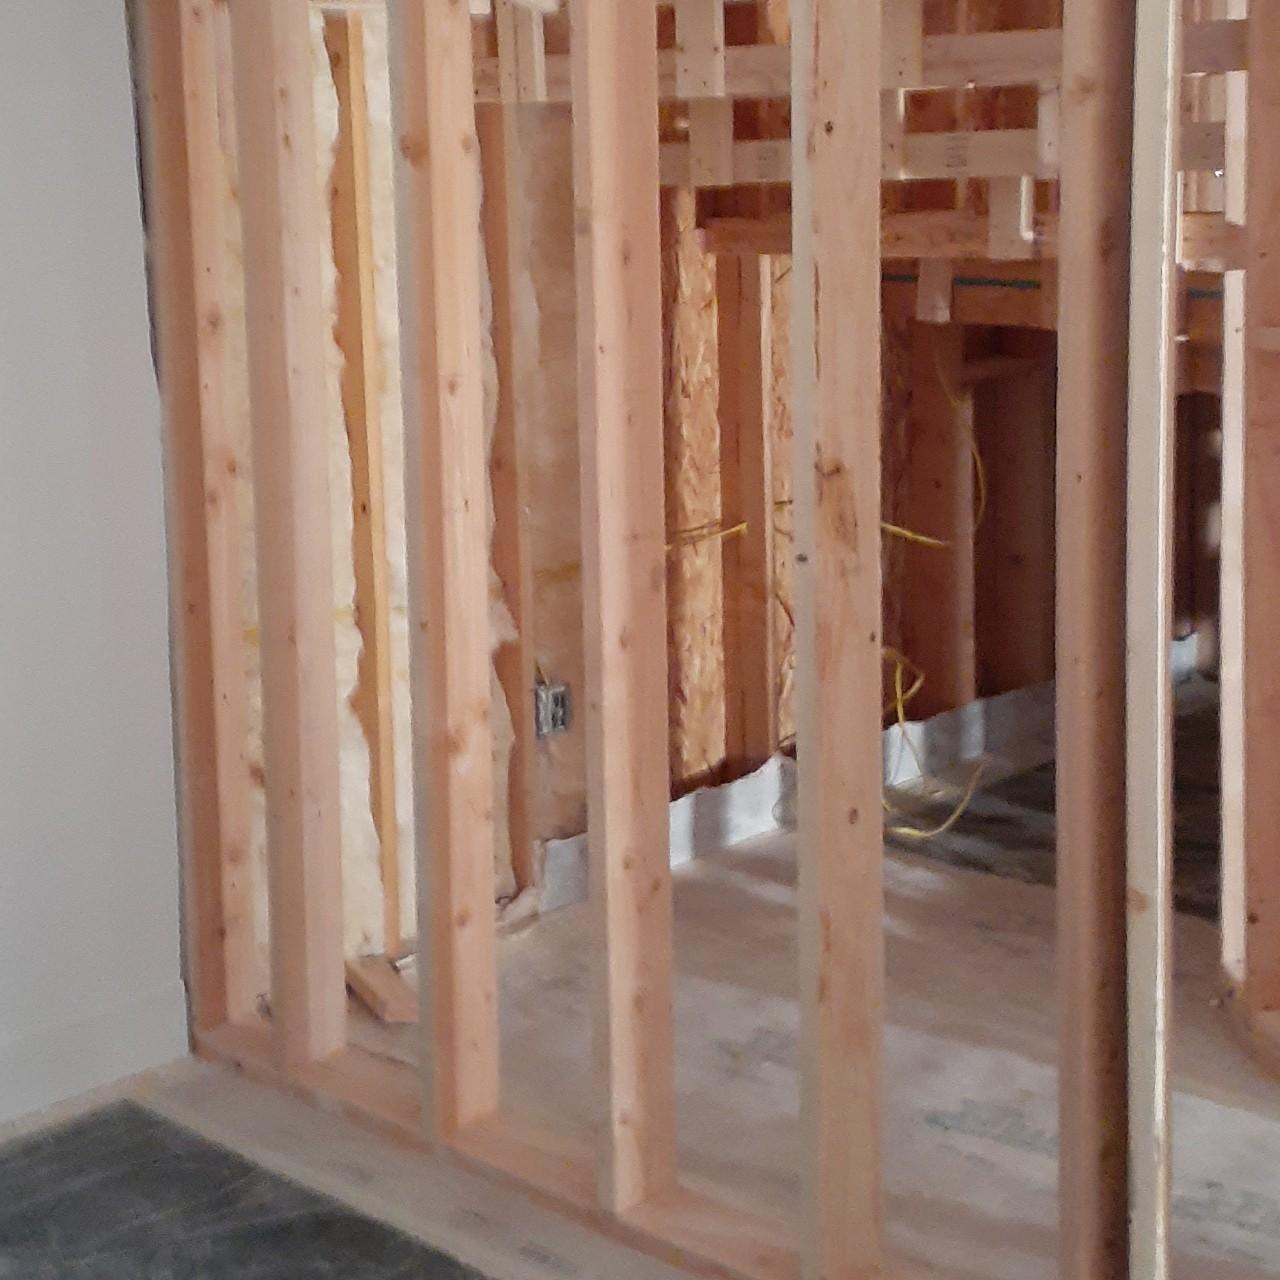 carpentry-wood-framing-second-floor-home-addition--framing-18